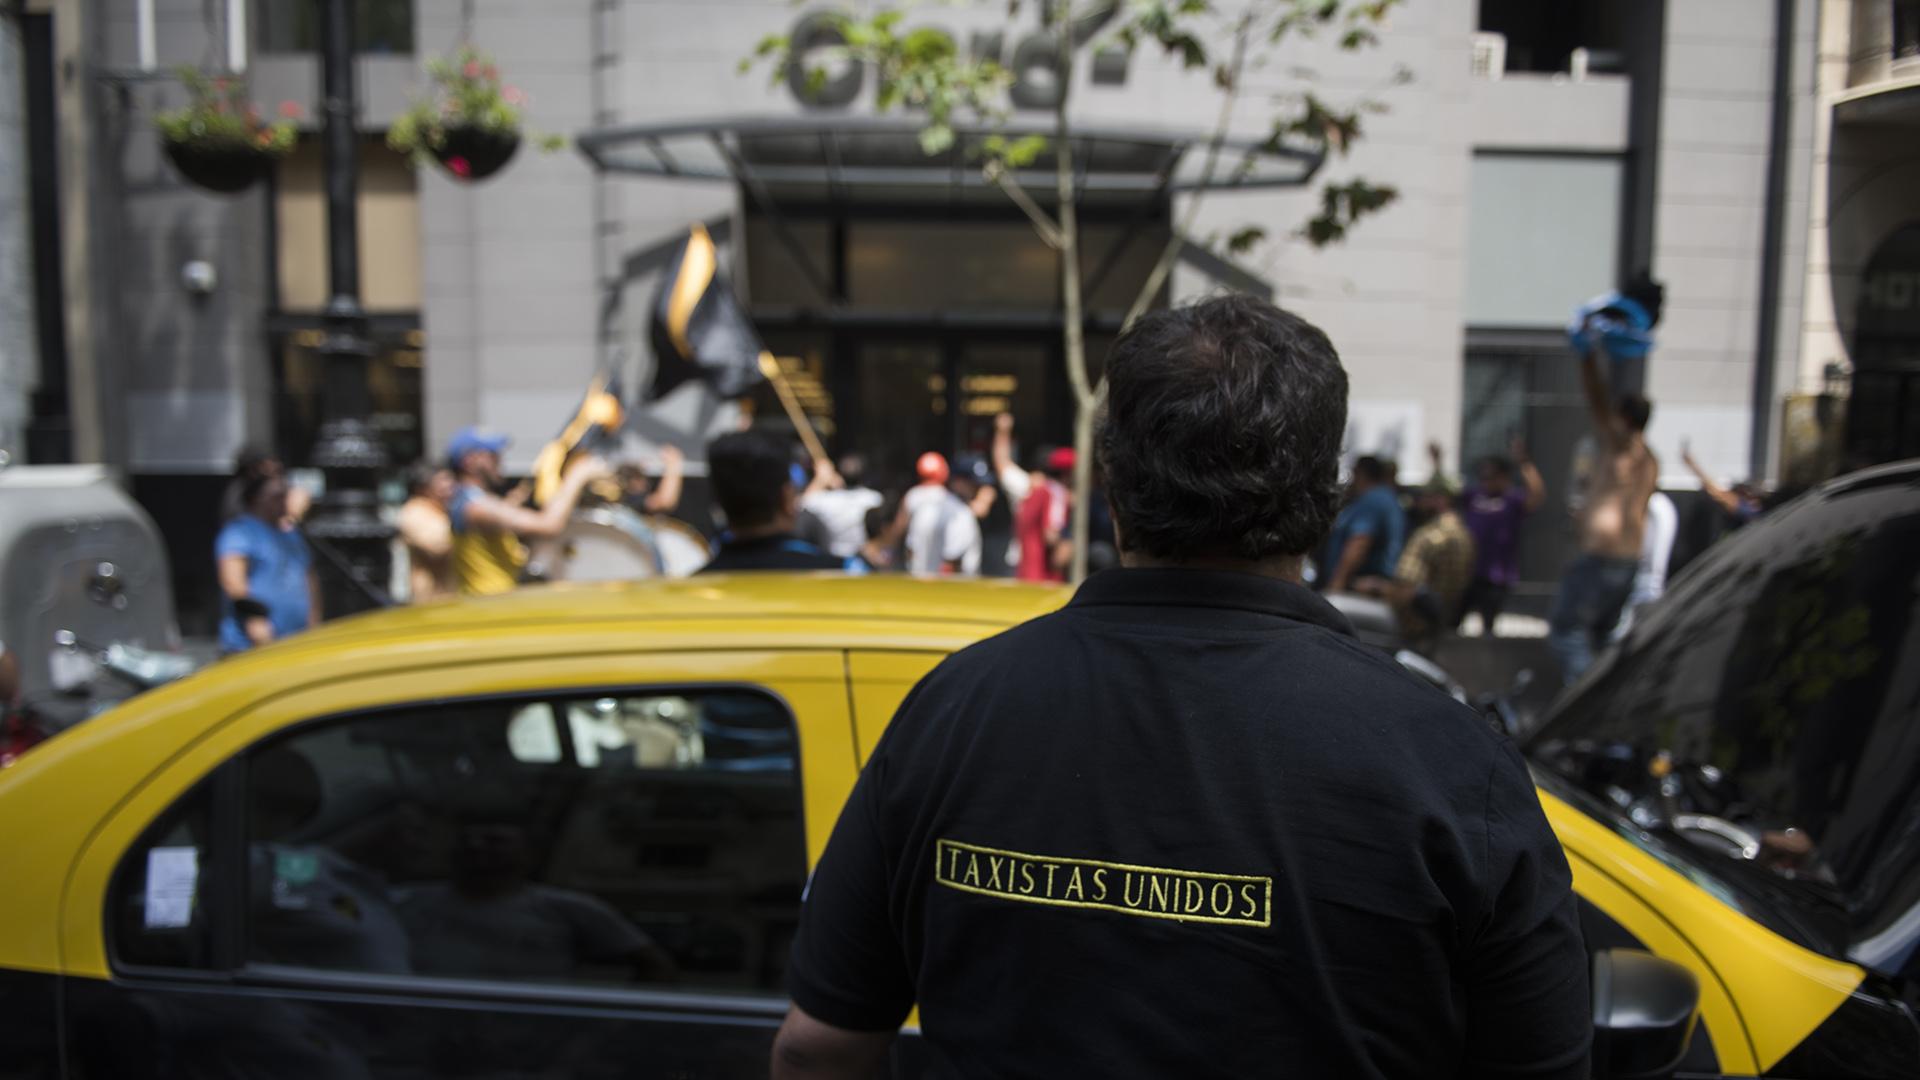 Camisa de Taxistas Unidos